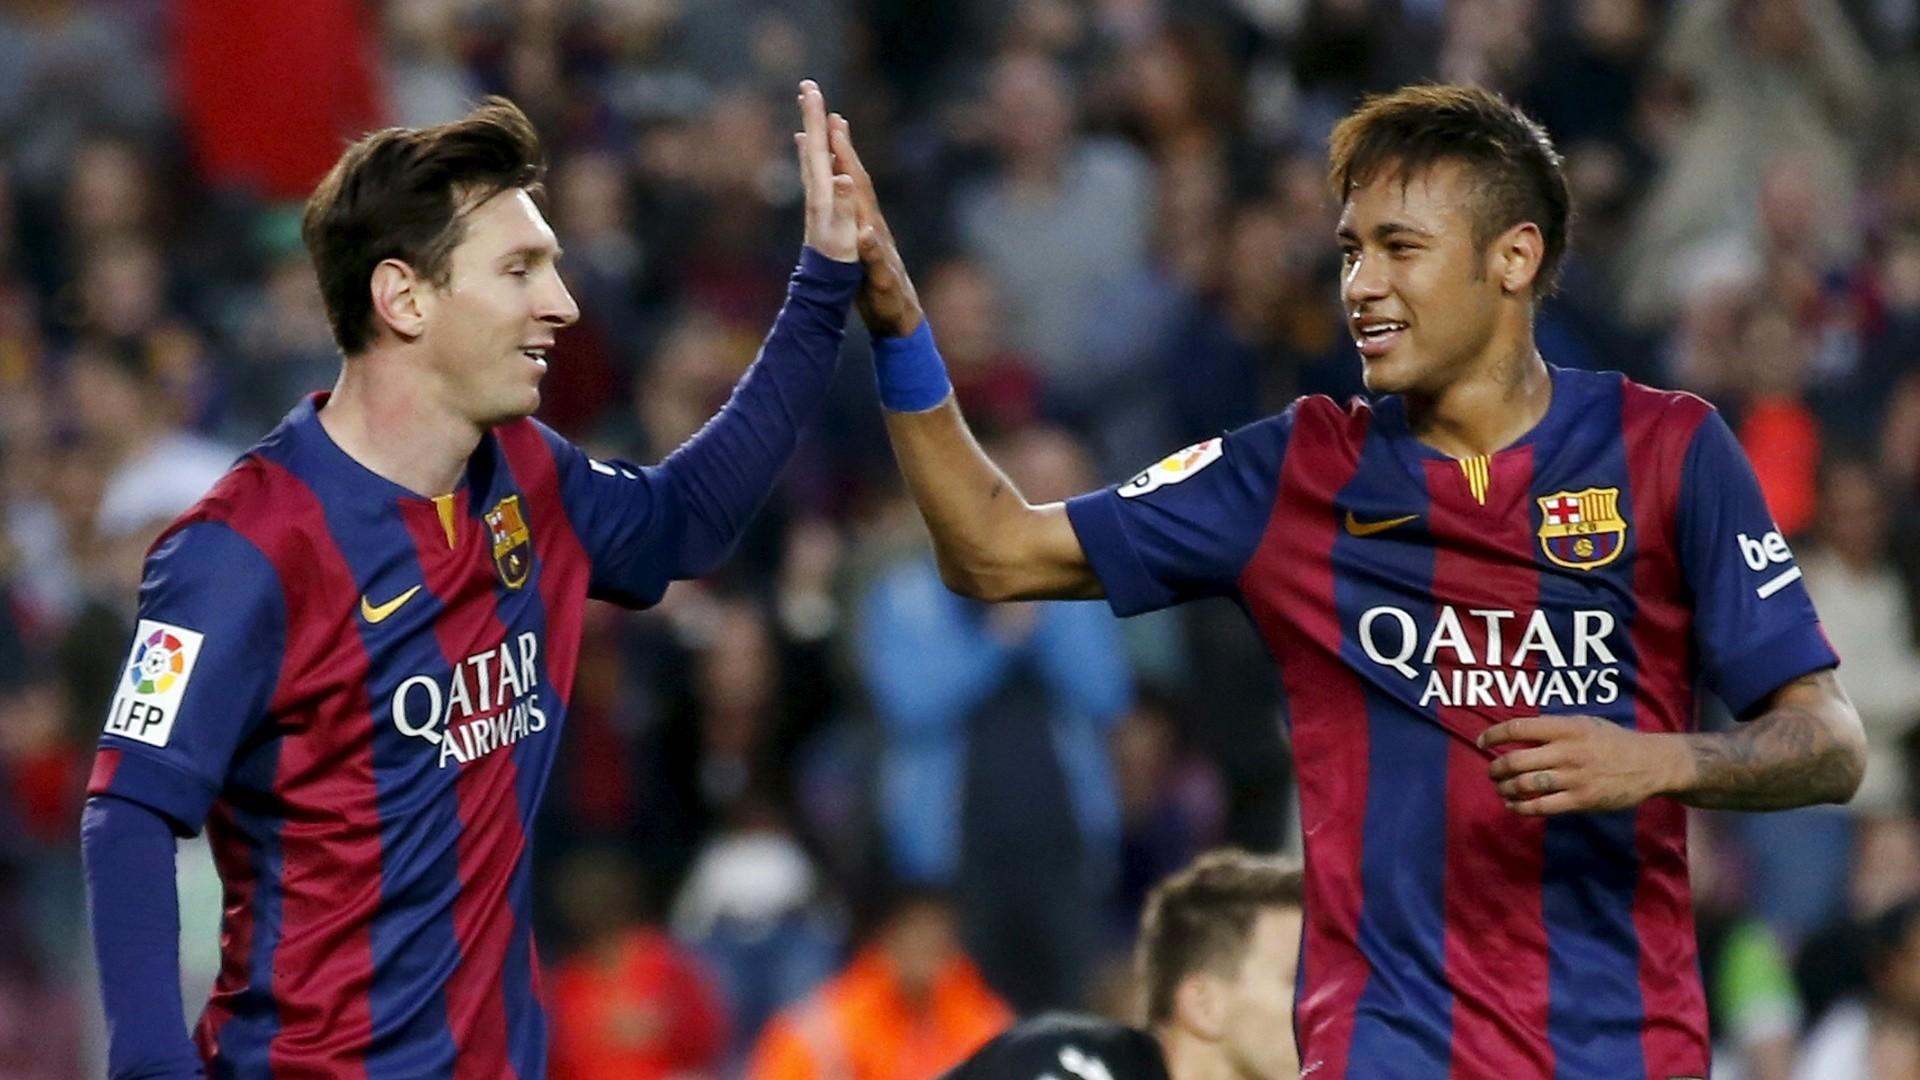 Barcelona Lionel Messi E Neymar. Wallpaper …